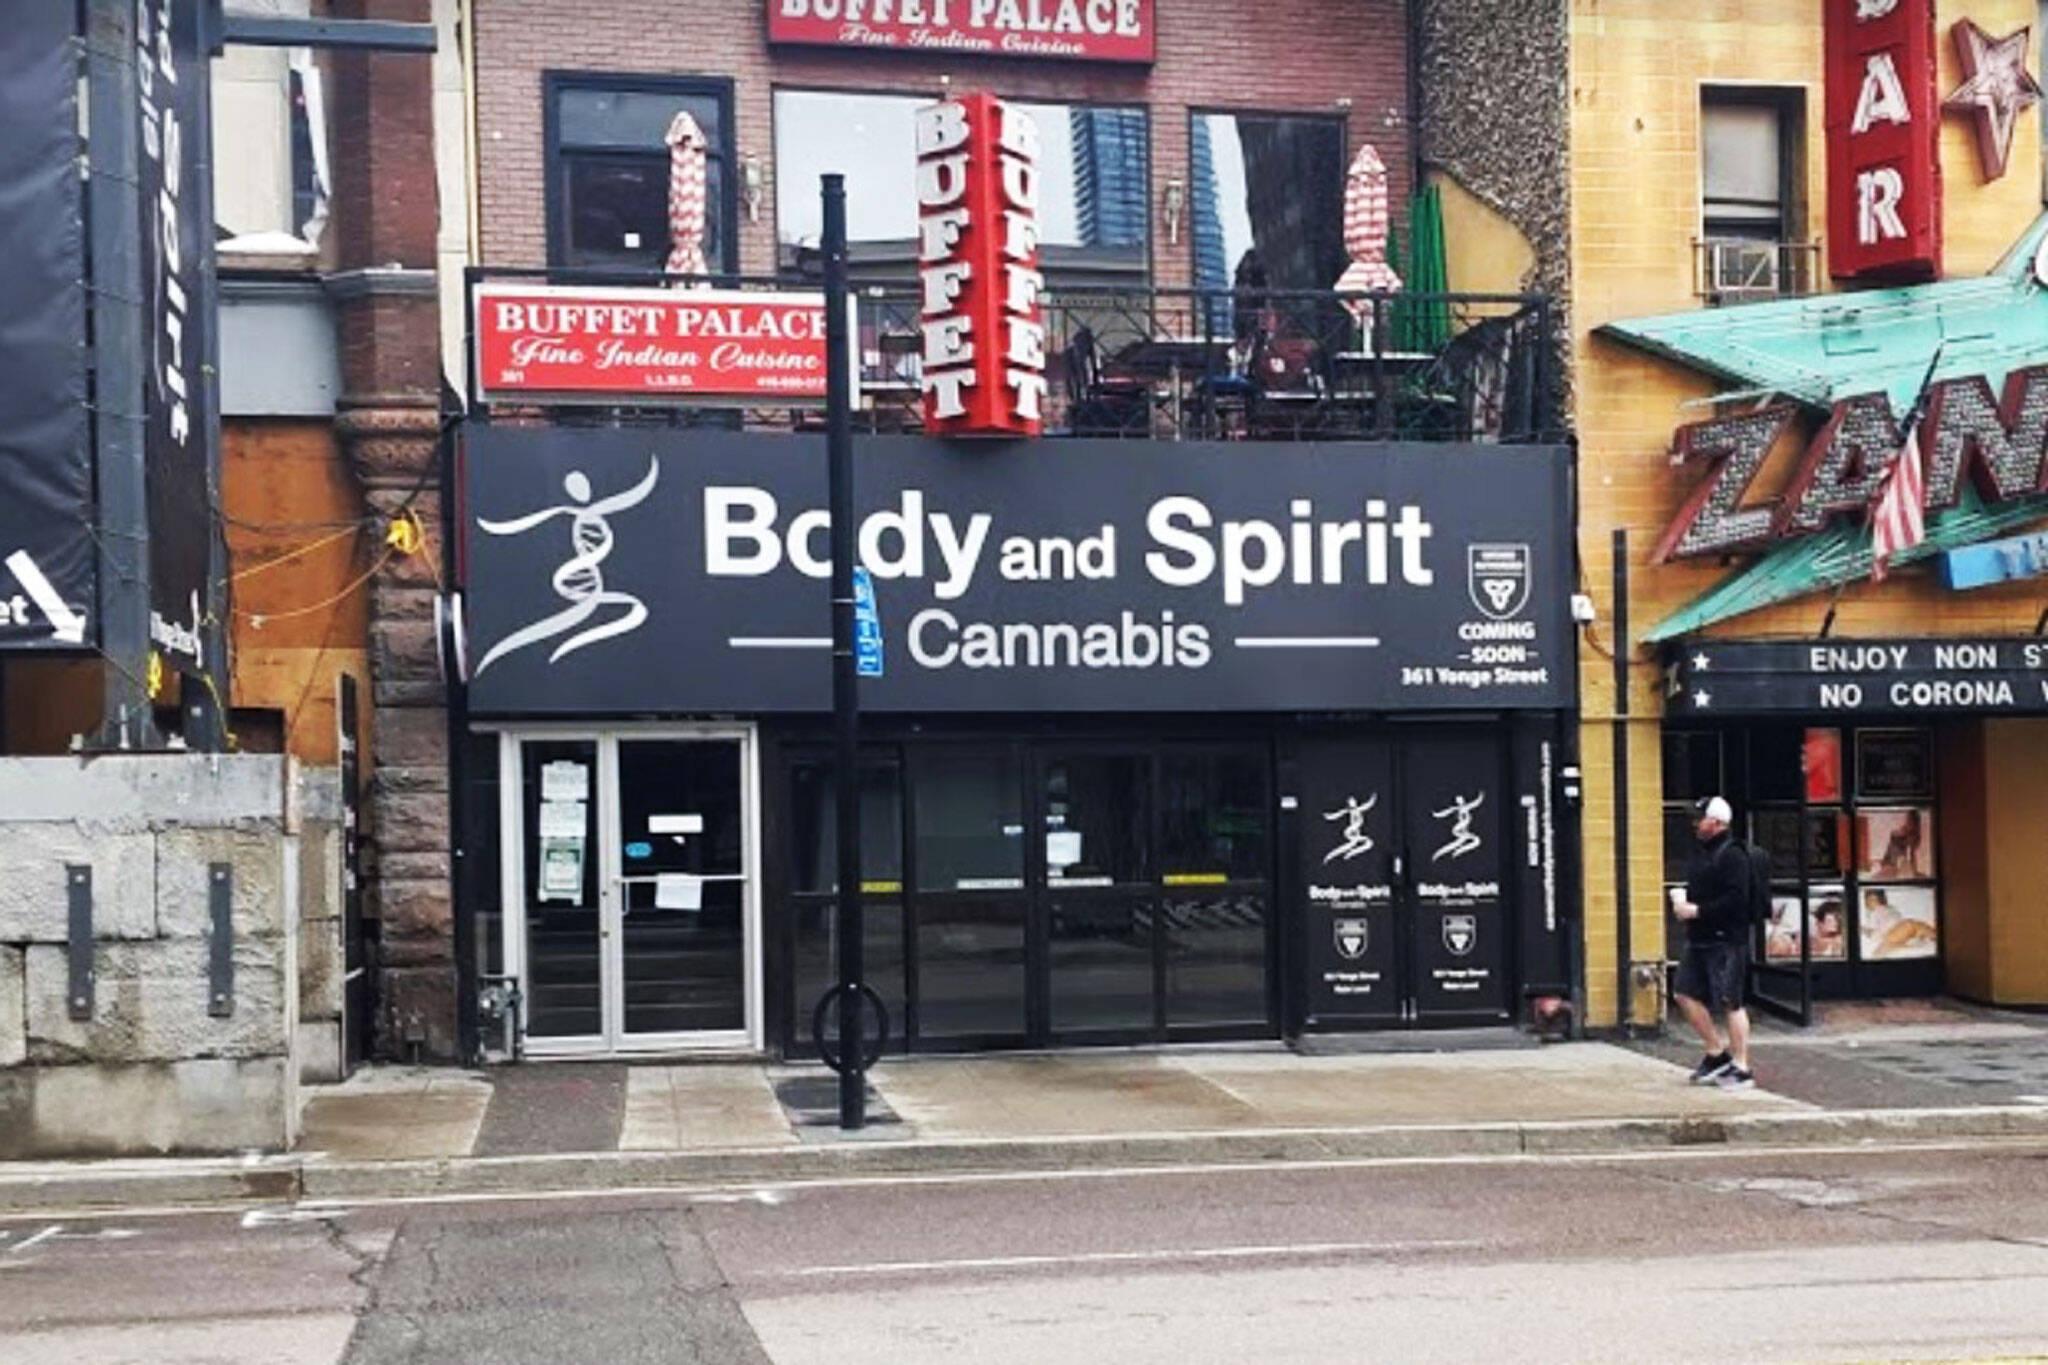 body and spirit cannabis toronto